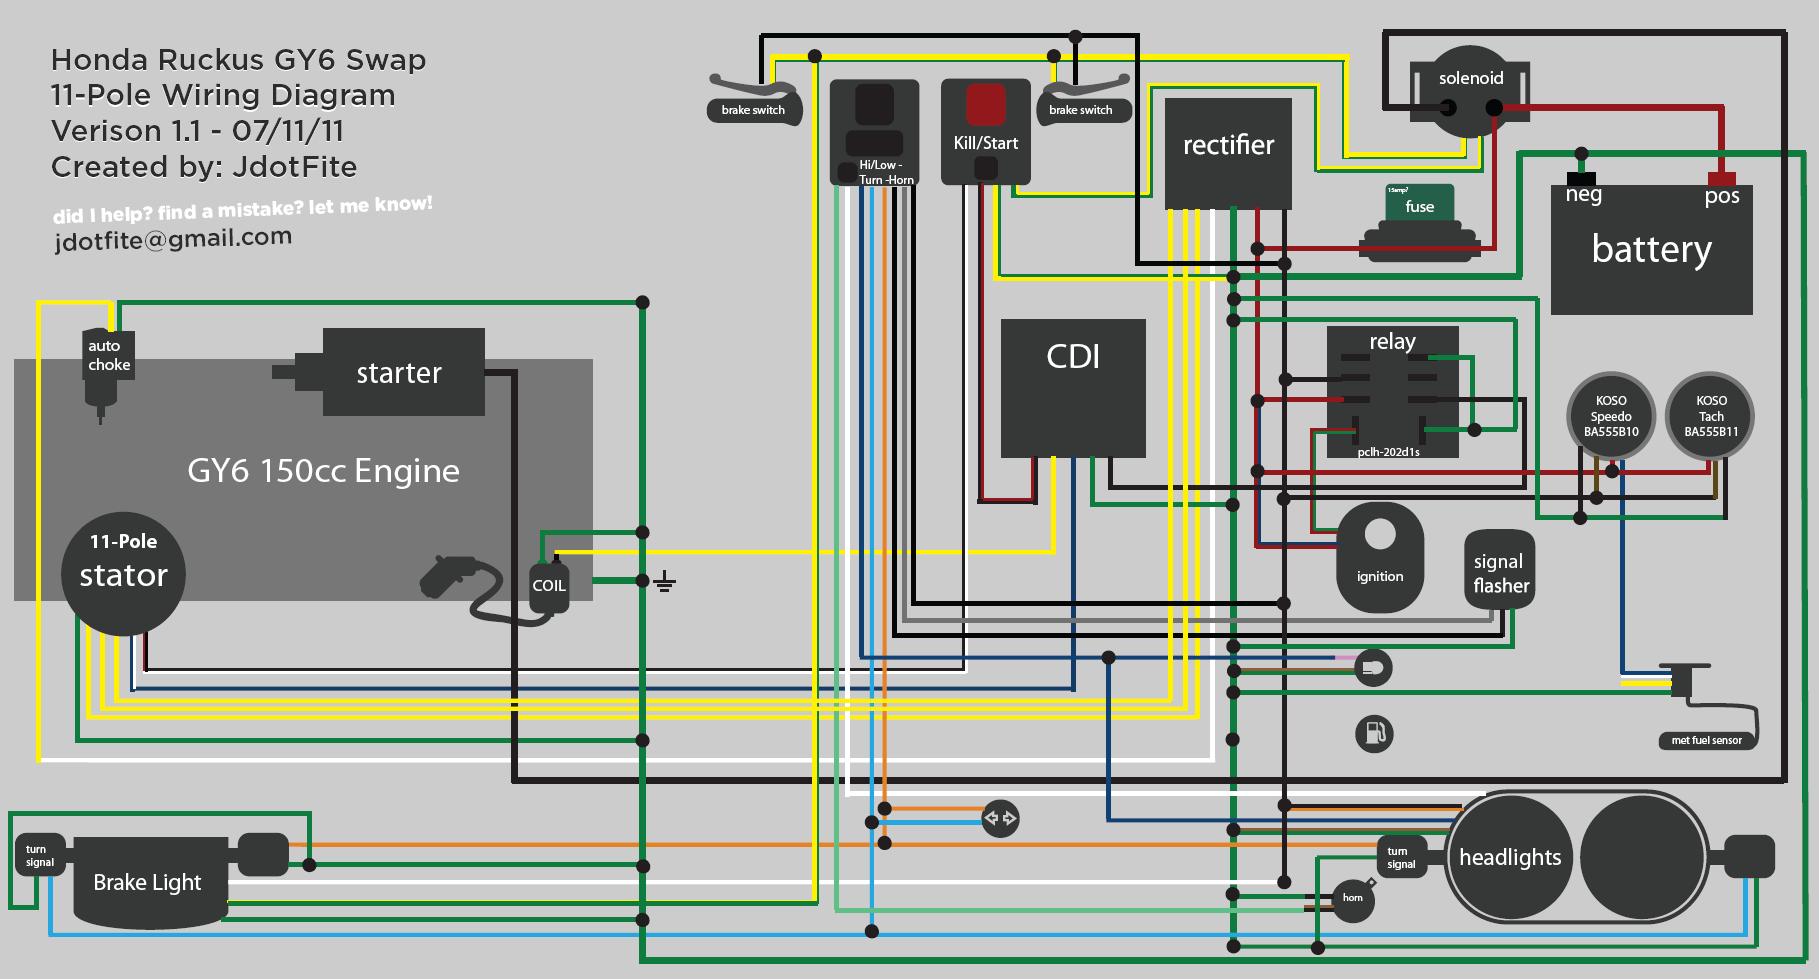 ruckus gy6 wiring diagram?resize\=665%2C358\&ssl\=1 razor go kart wiring diagram razor go kart parts \u2022 free wiring gy6 go kart wiring harness at bayanpartner.co